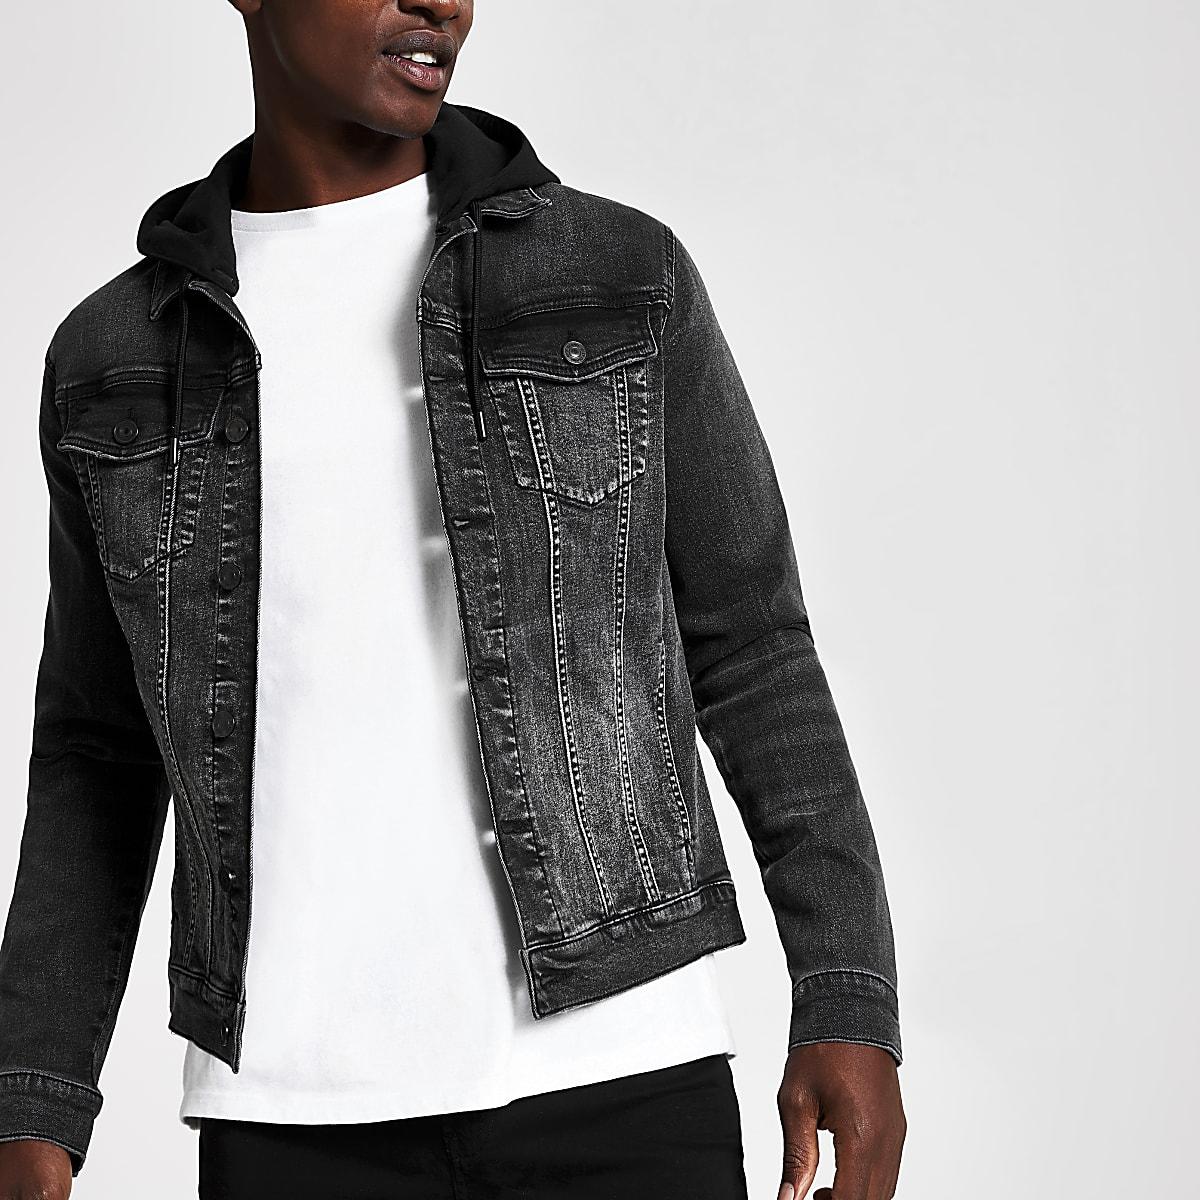 Black muscle fit hooded denim jacket